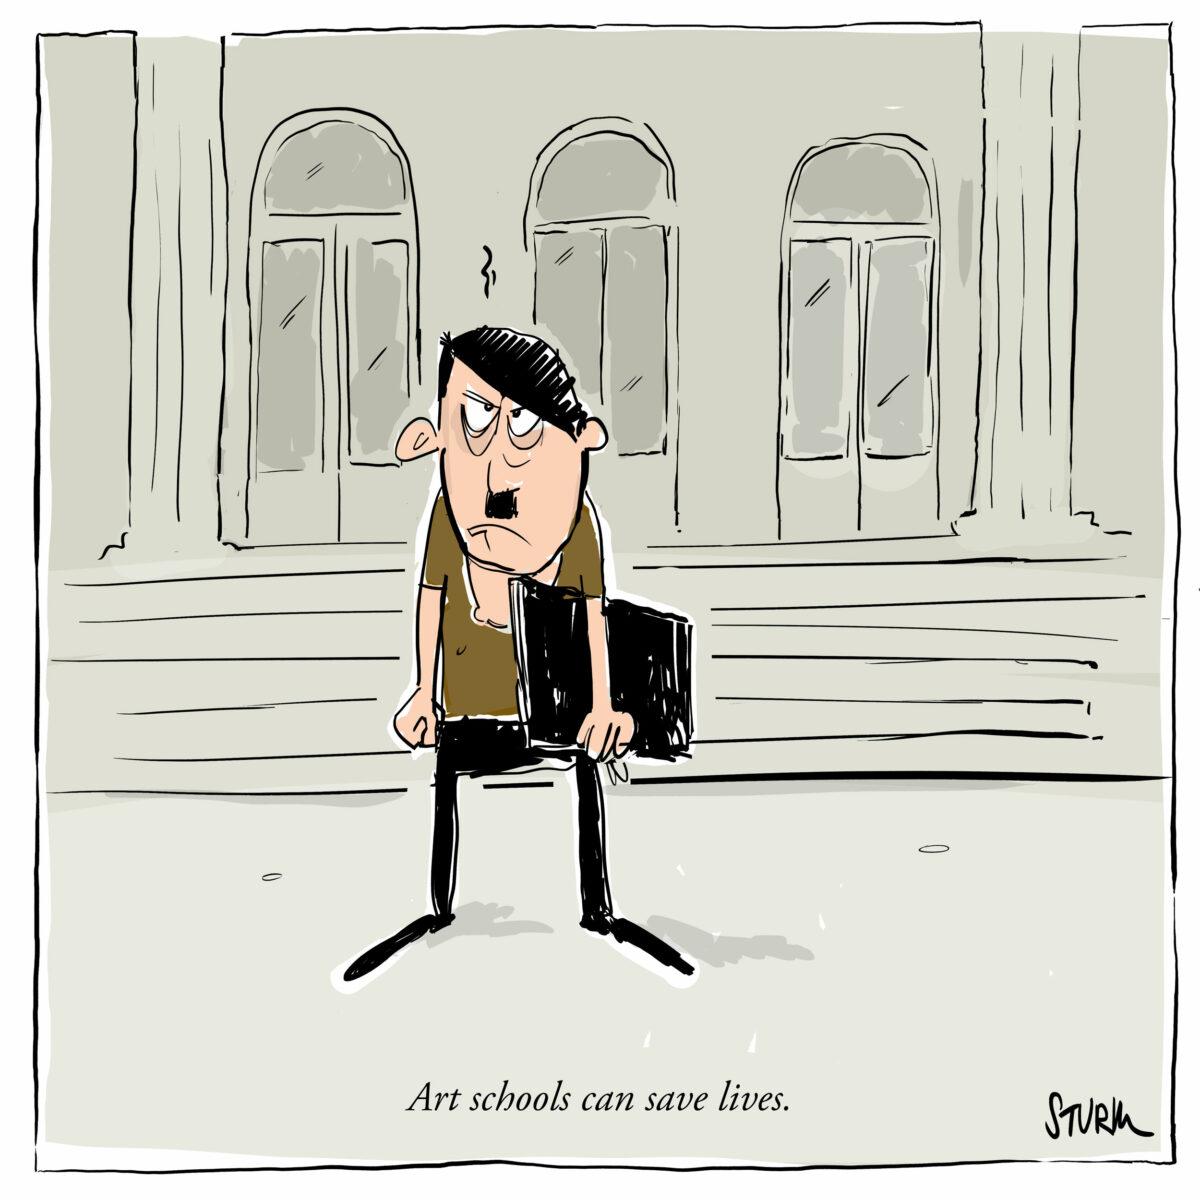 Art schools can save lives - Cartoon by Philipp Sturm